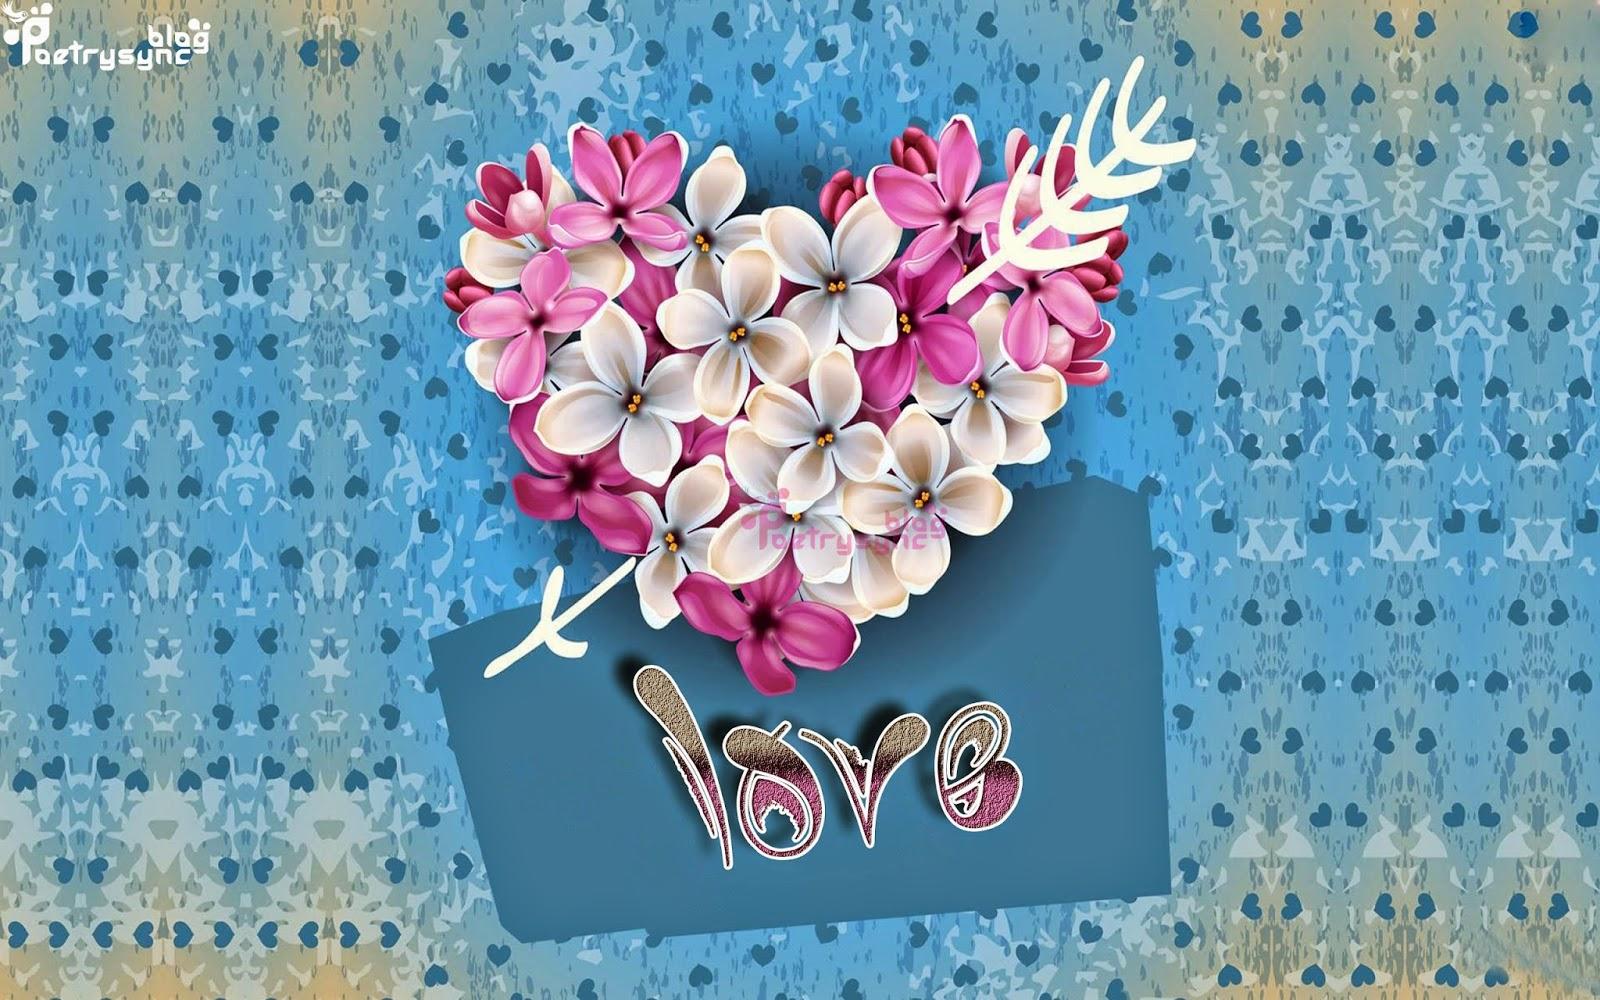 Love Heart Image Wallpaper Photo HD Wide